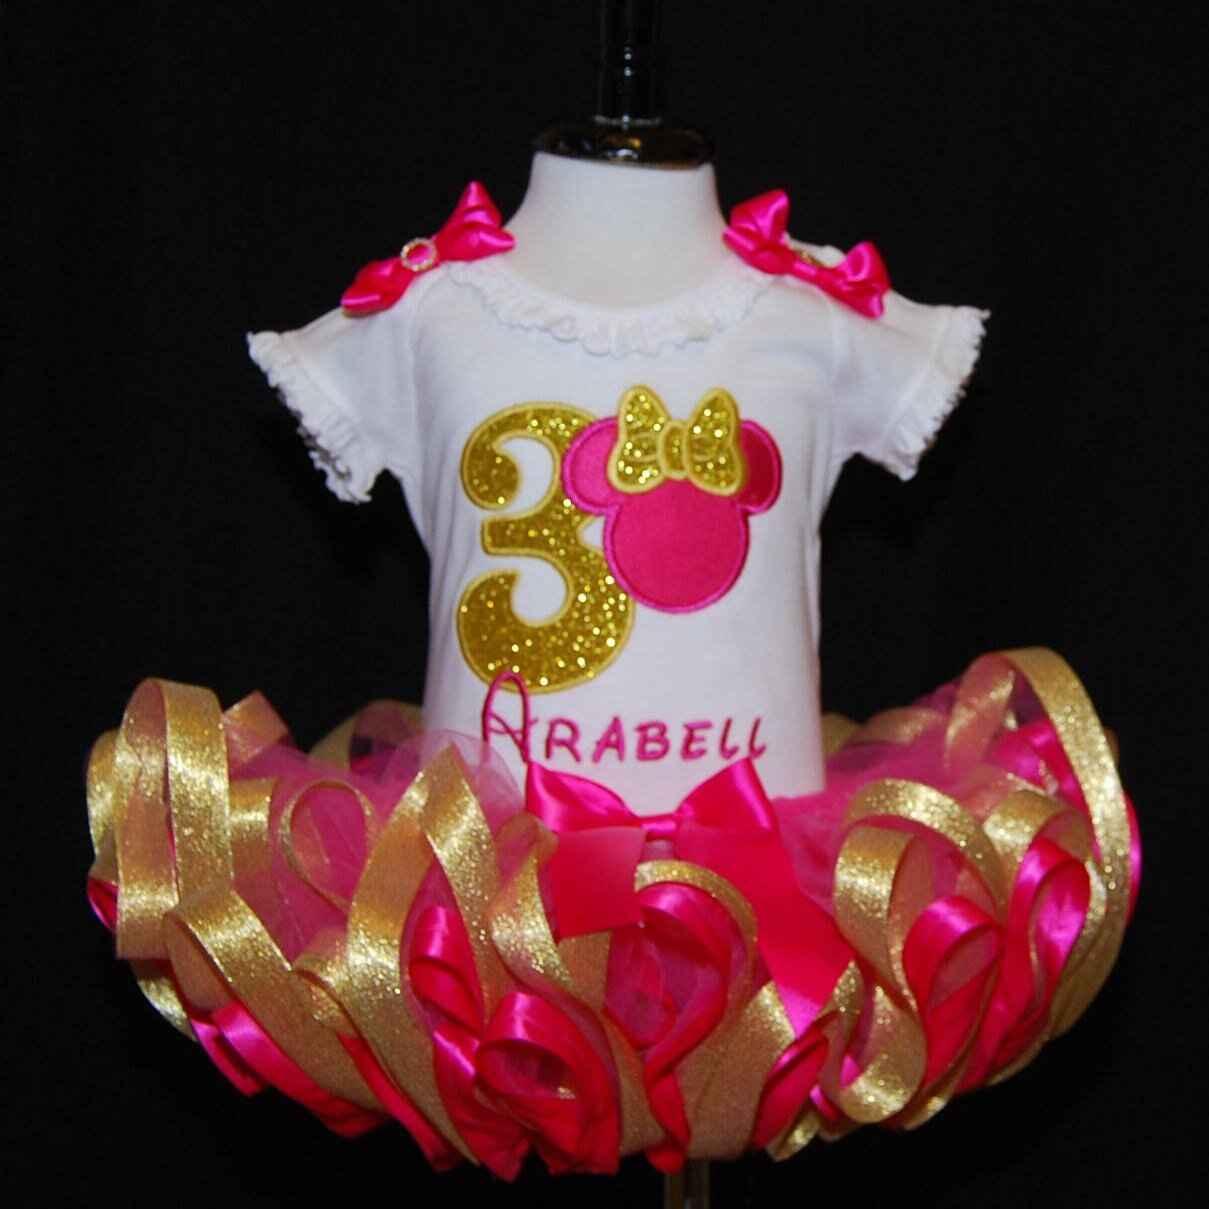 Birthday Tutu Shocking Pink and Gold Minnie Mouse Third Birthday Tutu Outfi 2 pieces